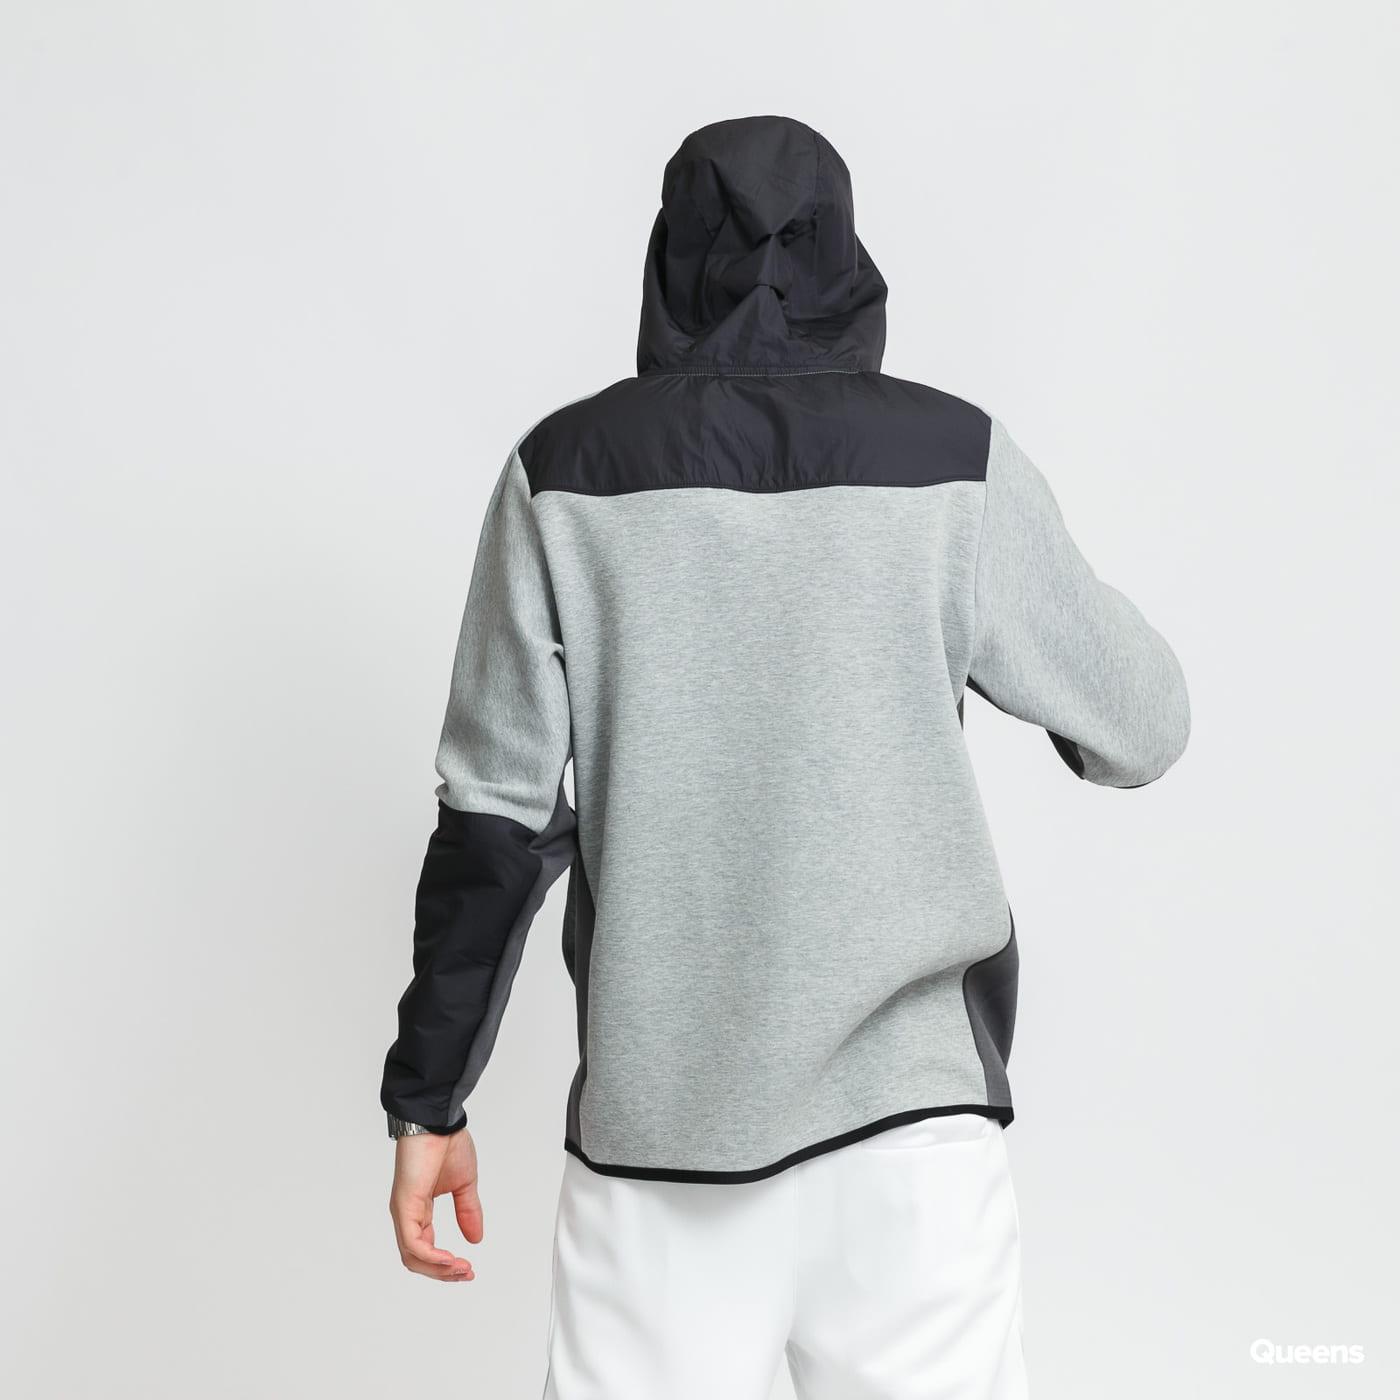 Nike M NSW Tech Fleece FZ Woven Hoodie Mix melange šedá / černá